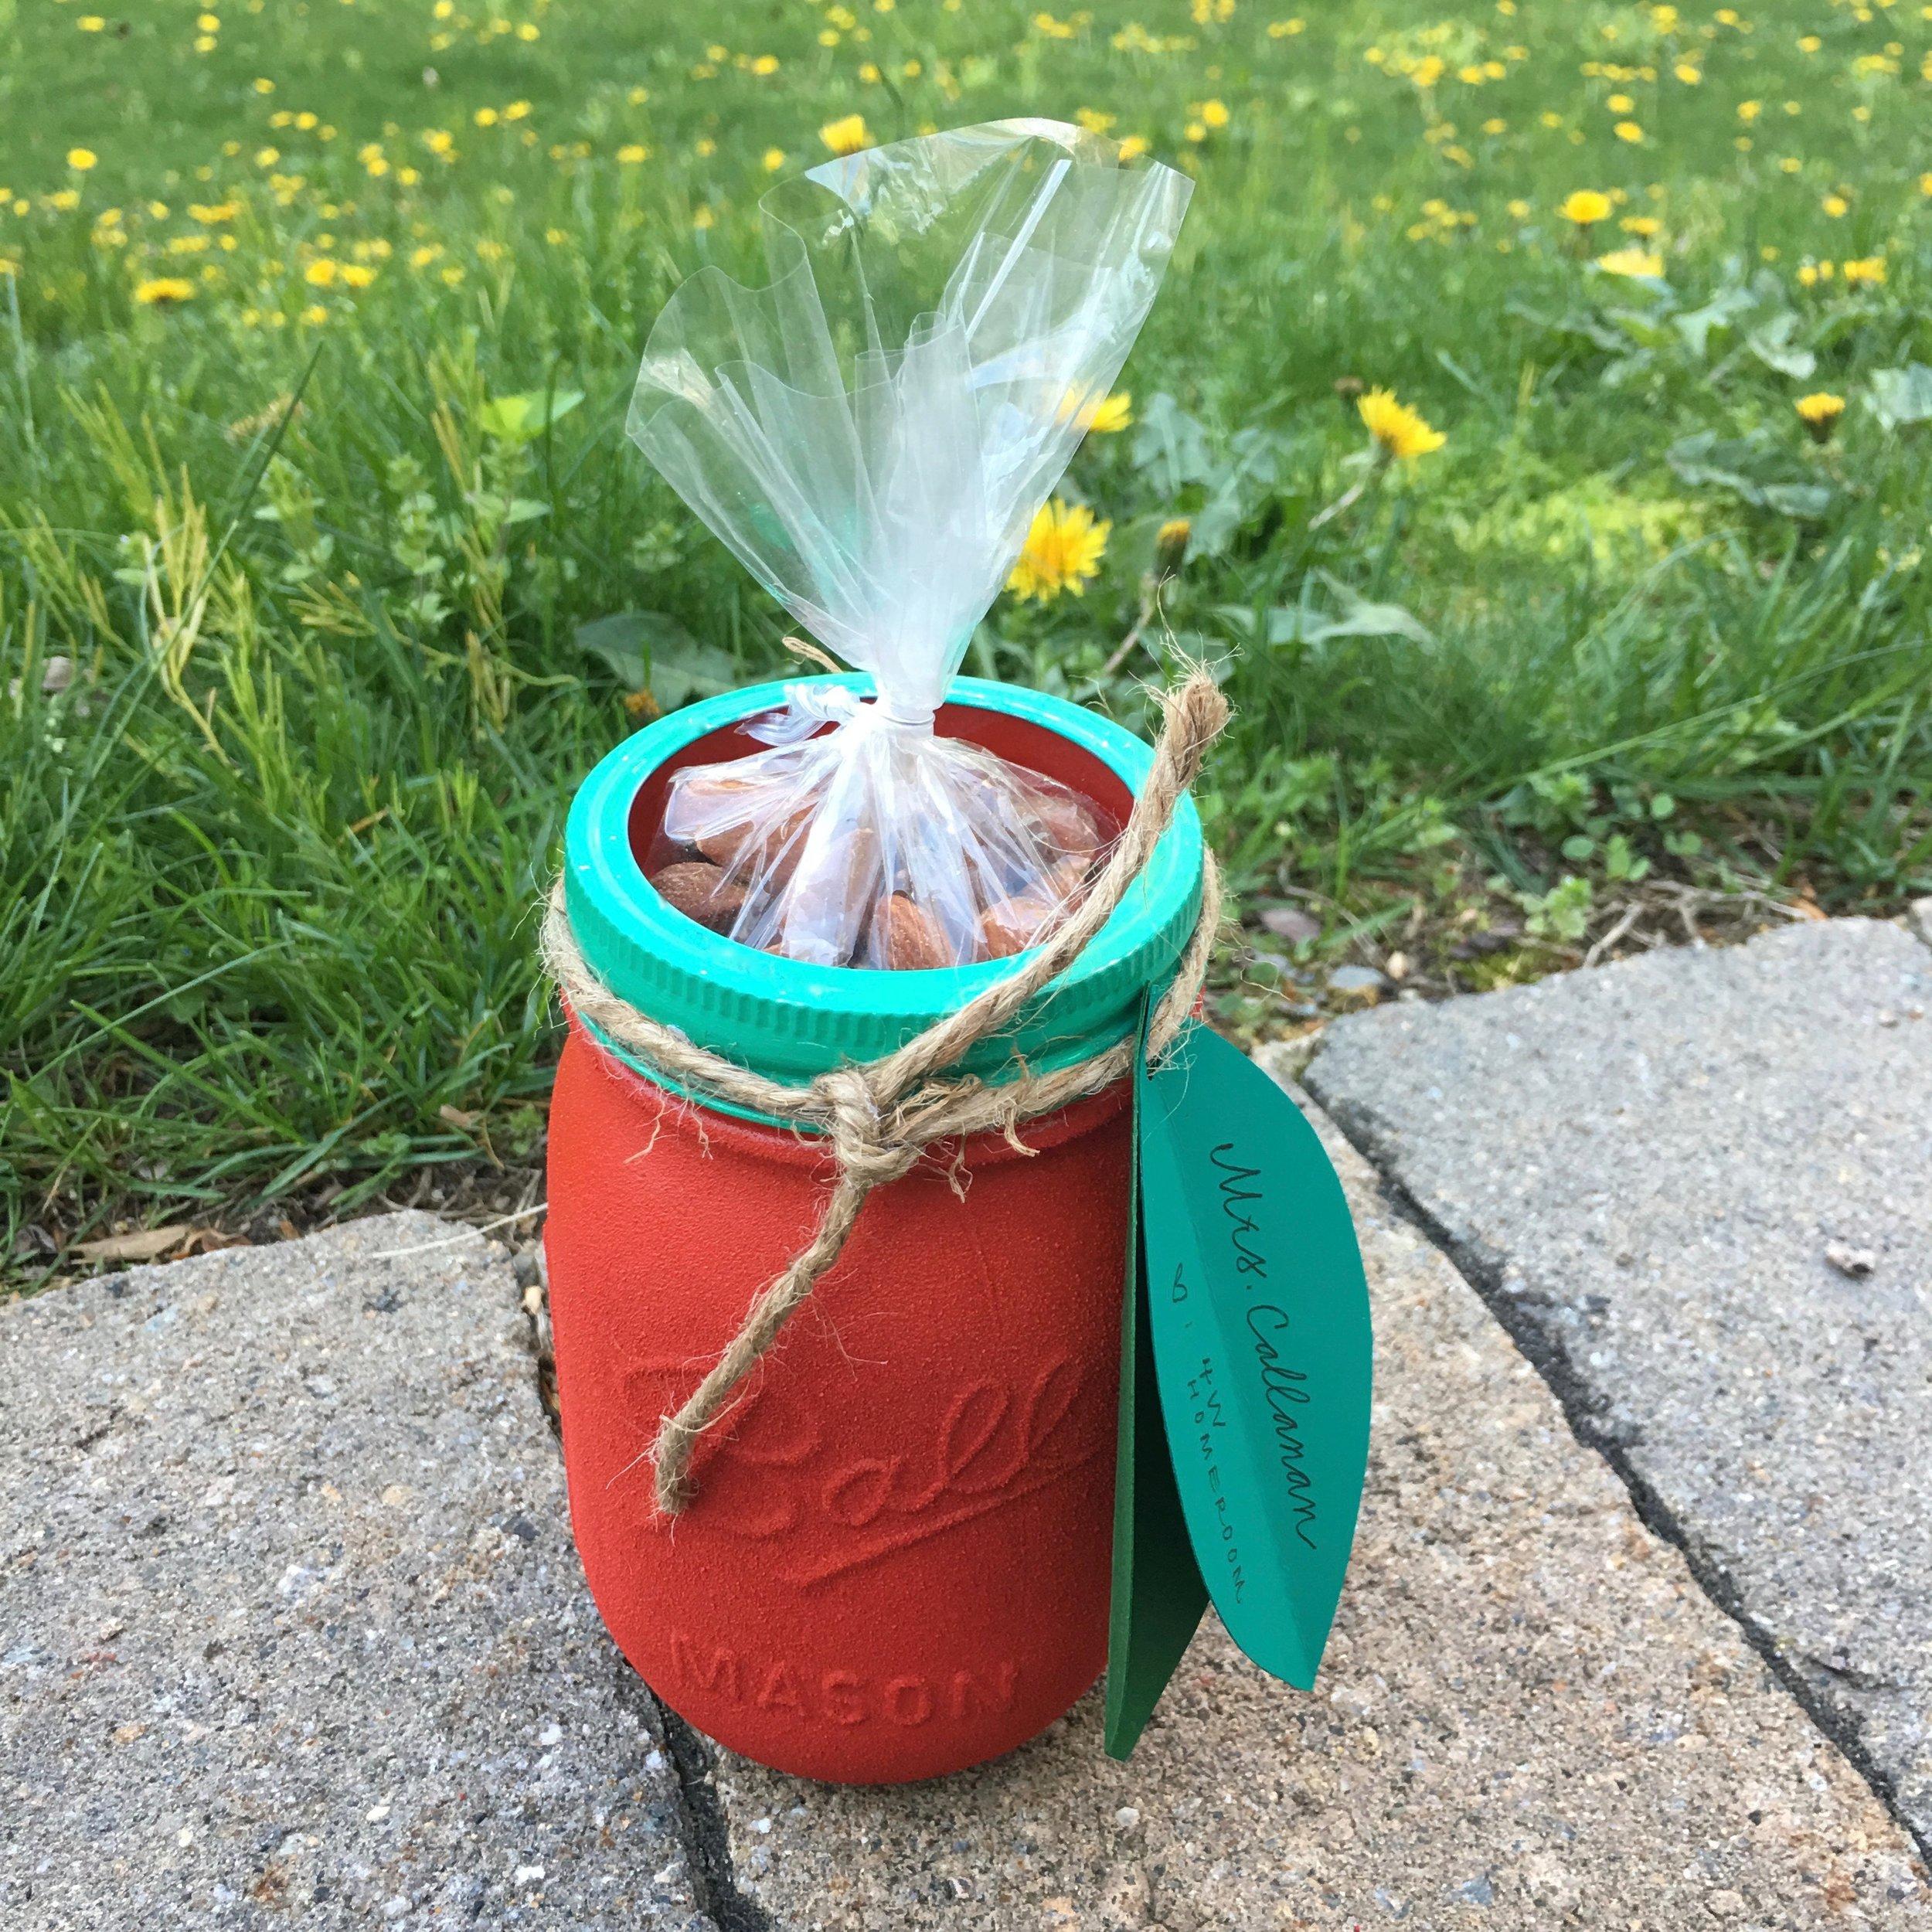 APPLE MASON JAR, FILLED WITH TREATS